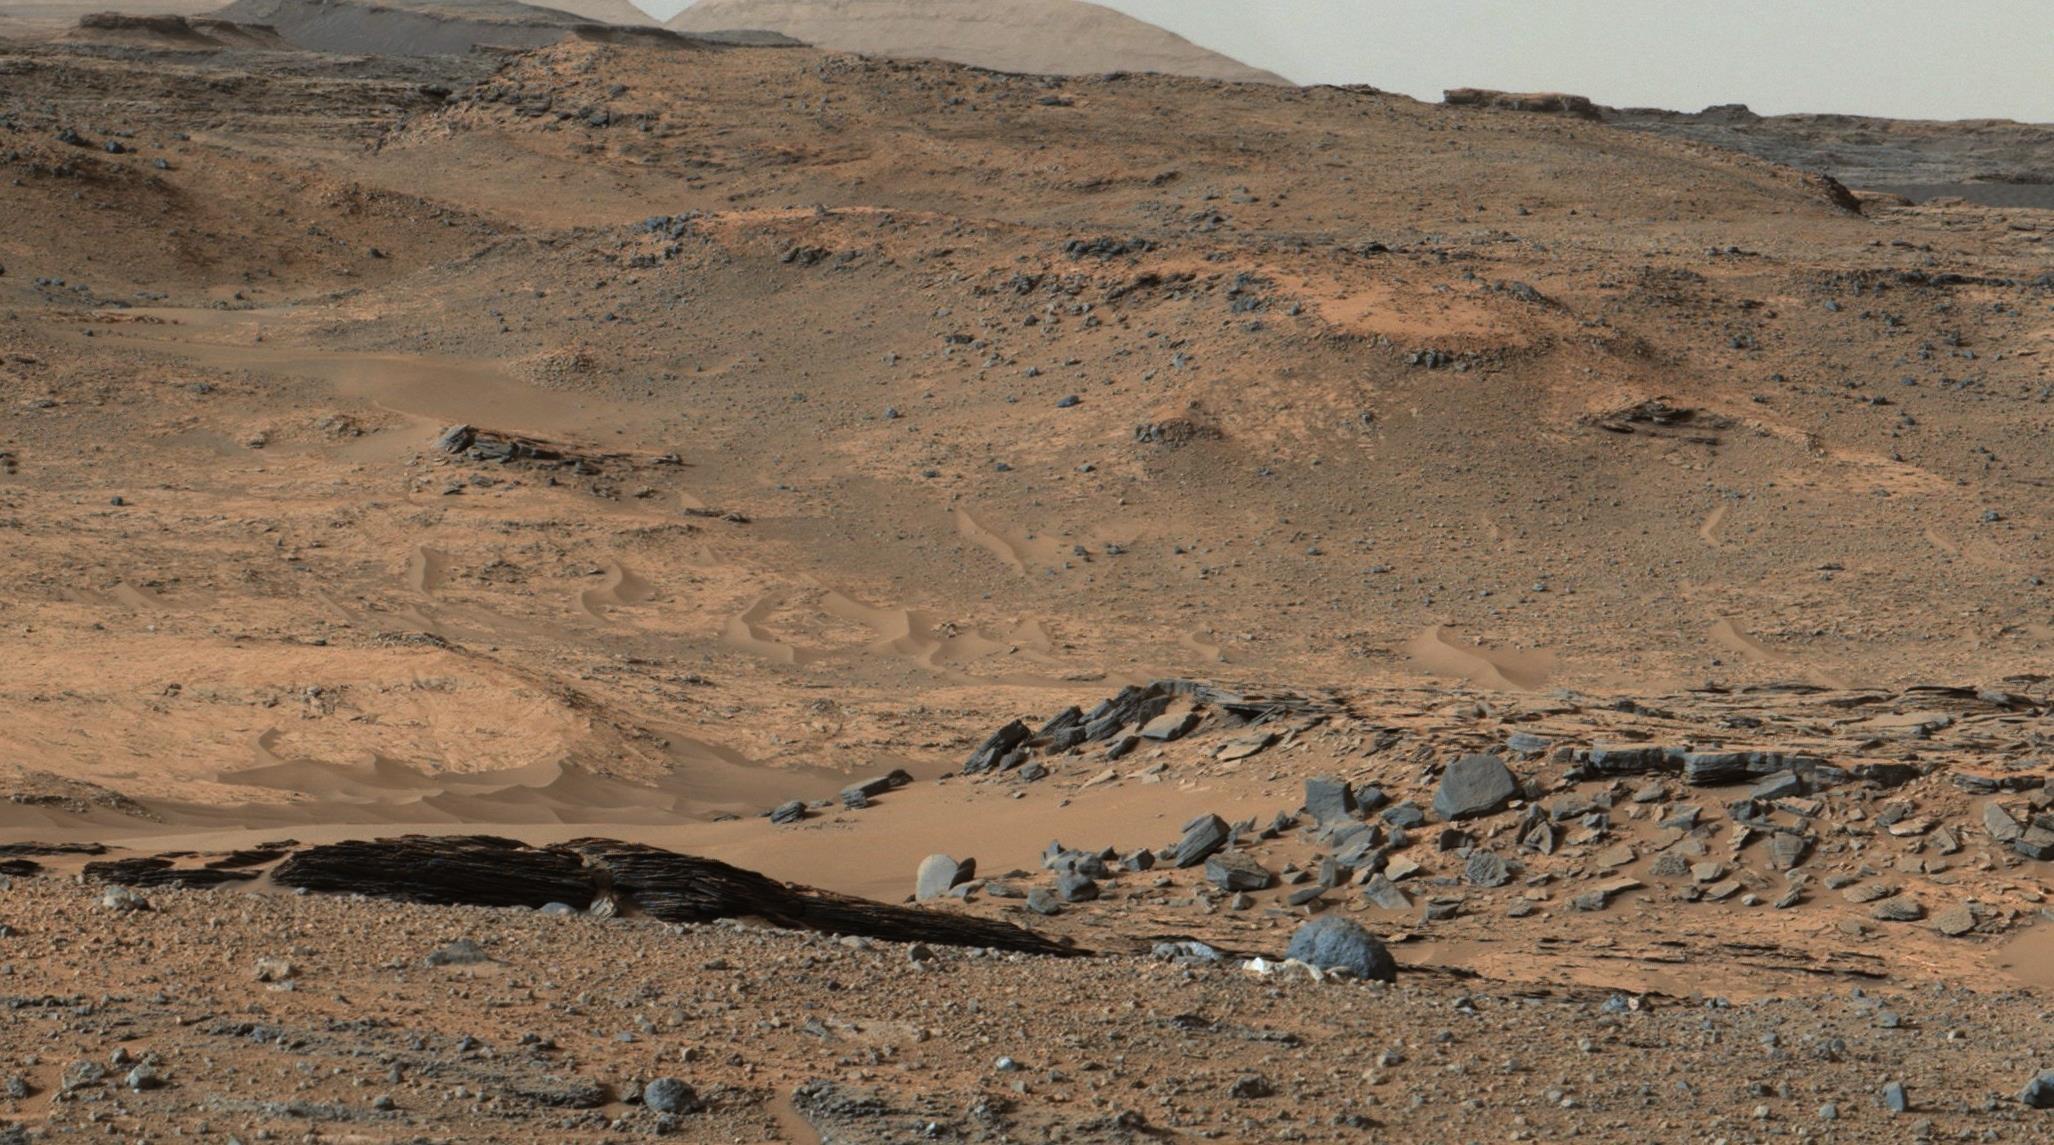 Mars Curiosity Rover Reaches Its Prime Destination Mount Sharp